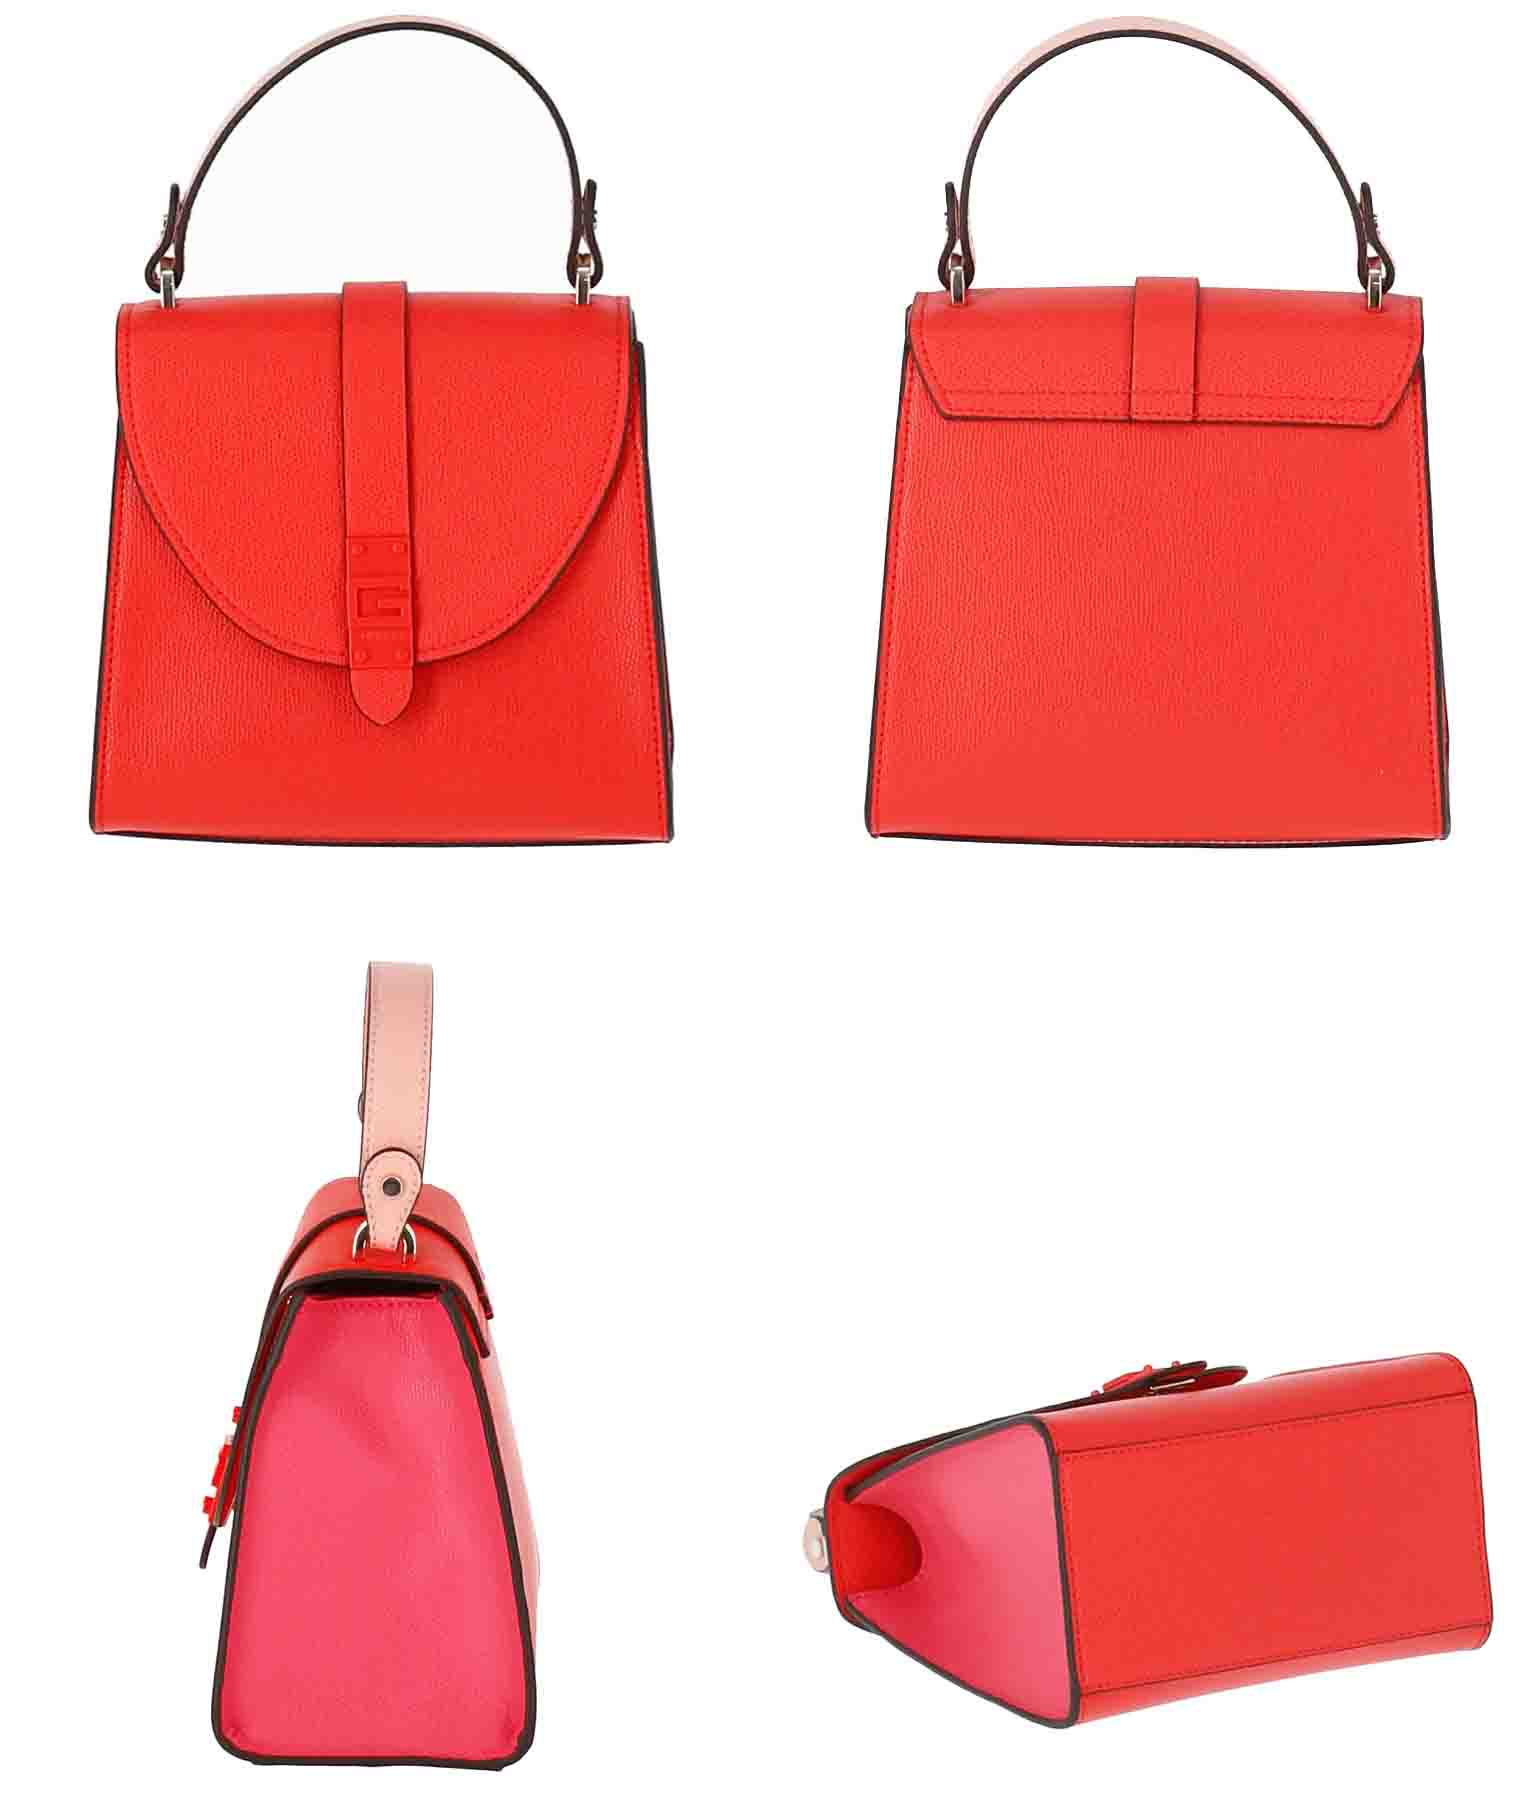 NEREA TOP HANDLE FLAP(バッグ・鞄・小物/ハンドバッグ・ショルダーバッグ) | GUESS